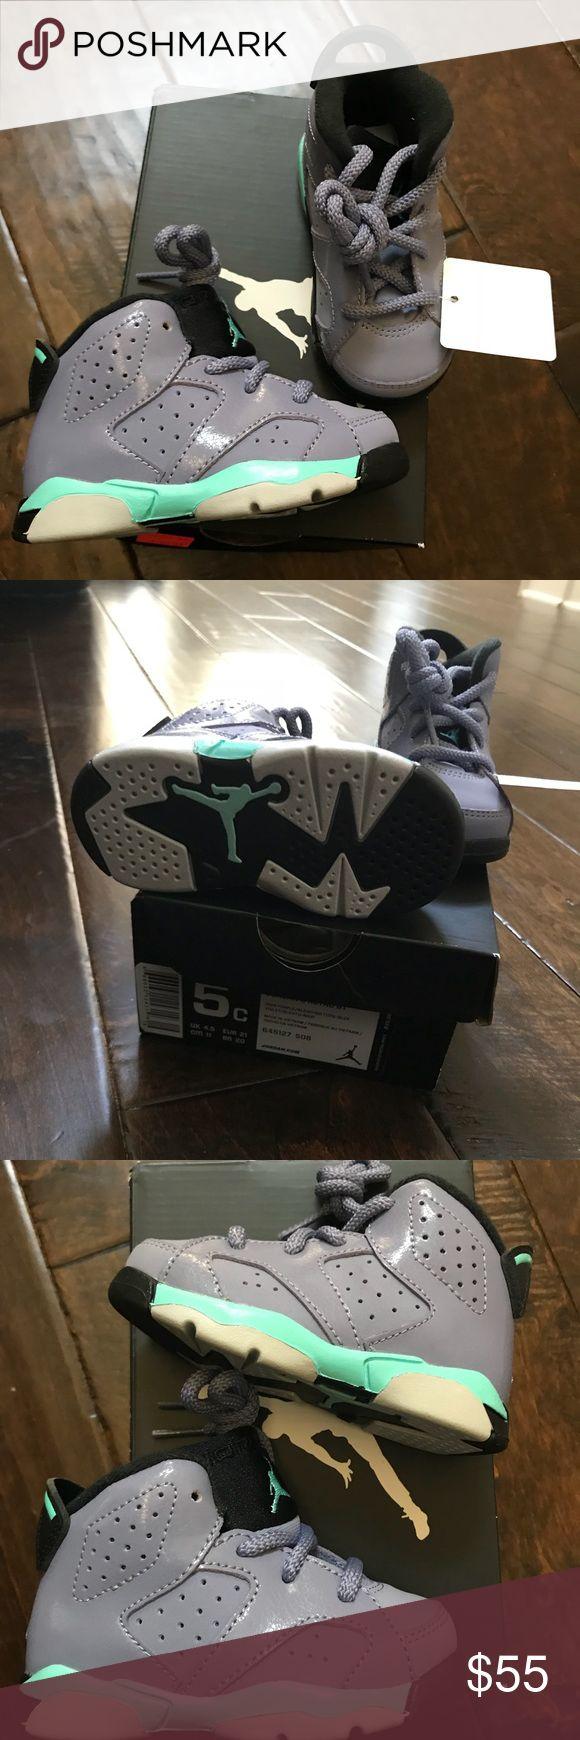 Authentic Jordan Retro 6 New Retro 6 Jordan's can be worn by both girls and boys! Air Jordan Shoes Sneakers